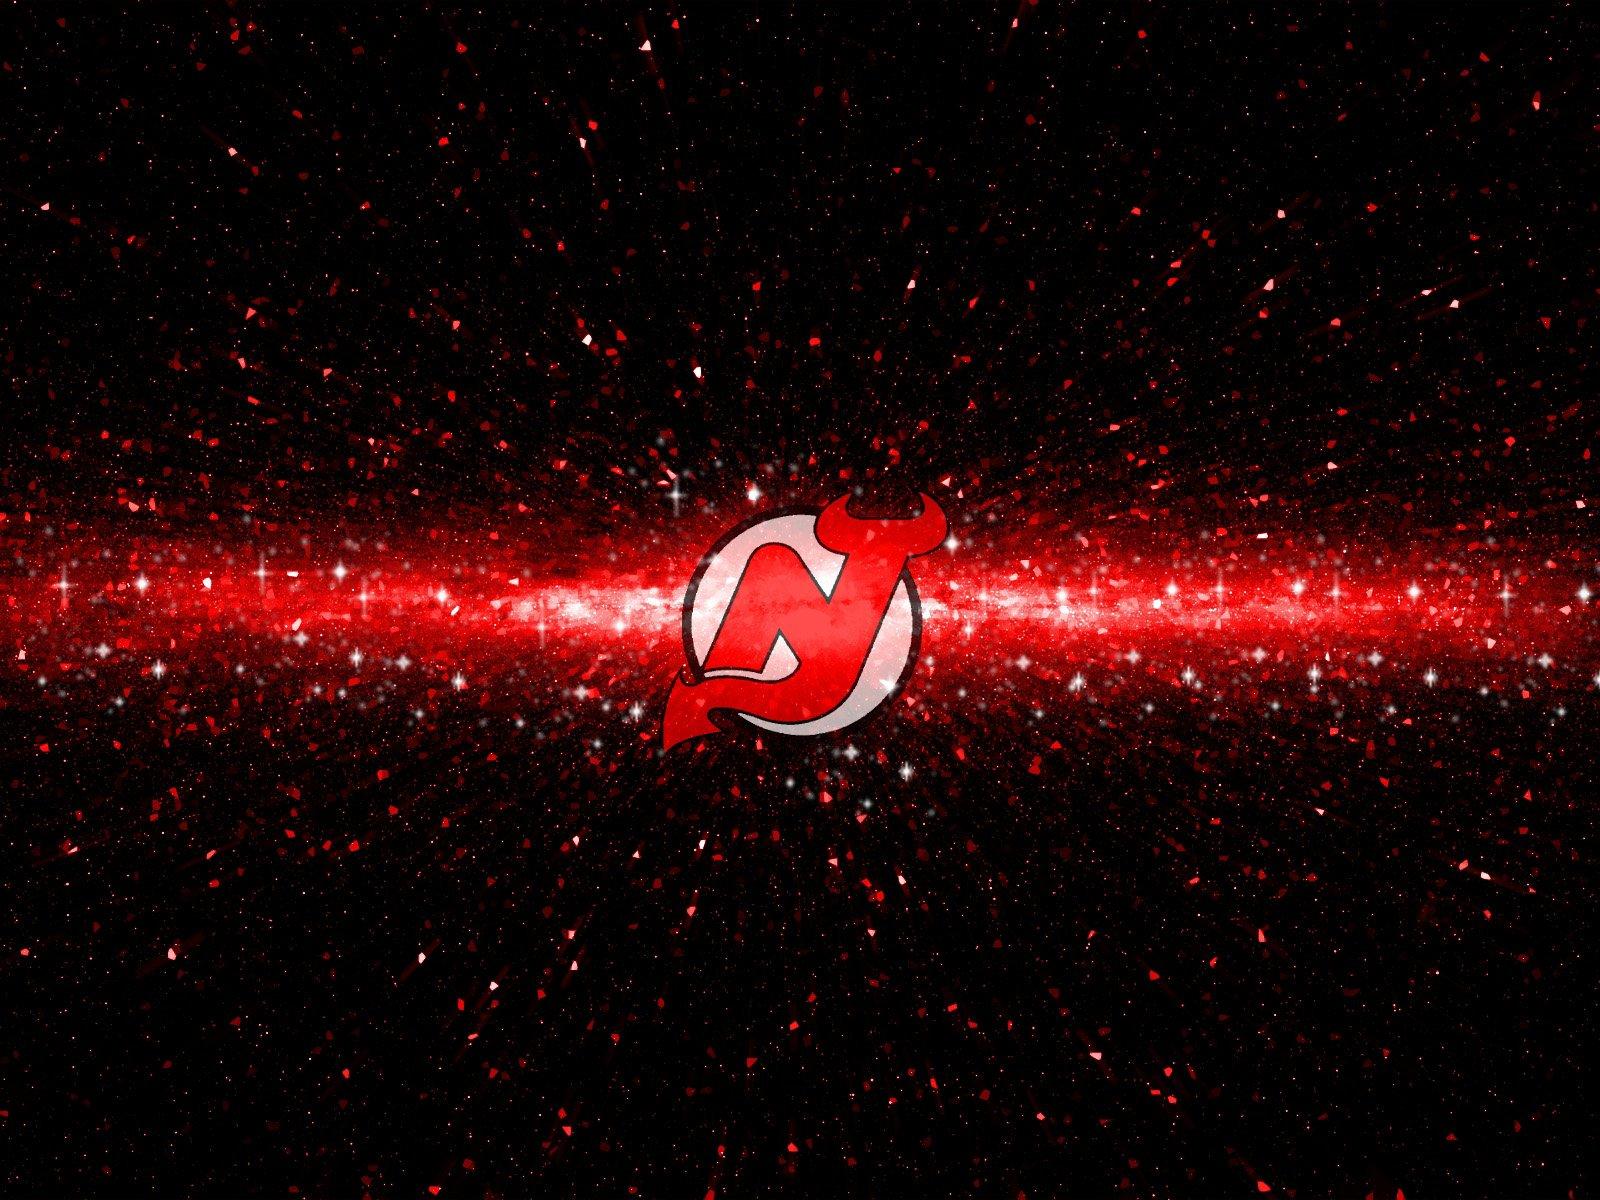 New Jersey Devils Nhl Hockey 40 Wallpaper 1600x1200 359265